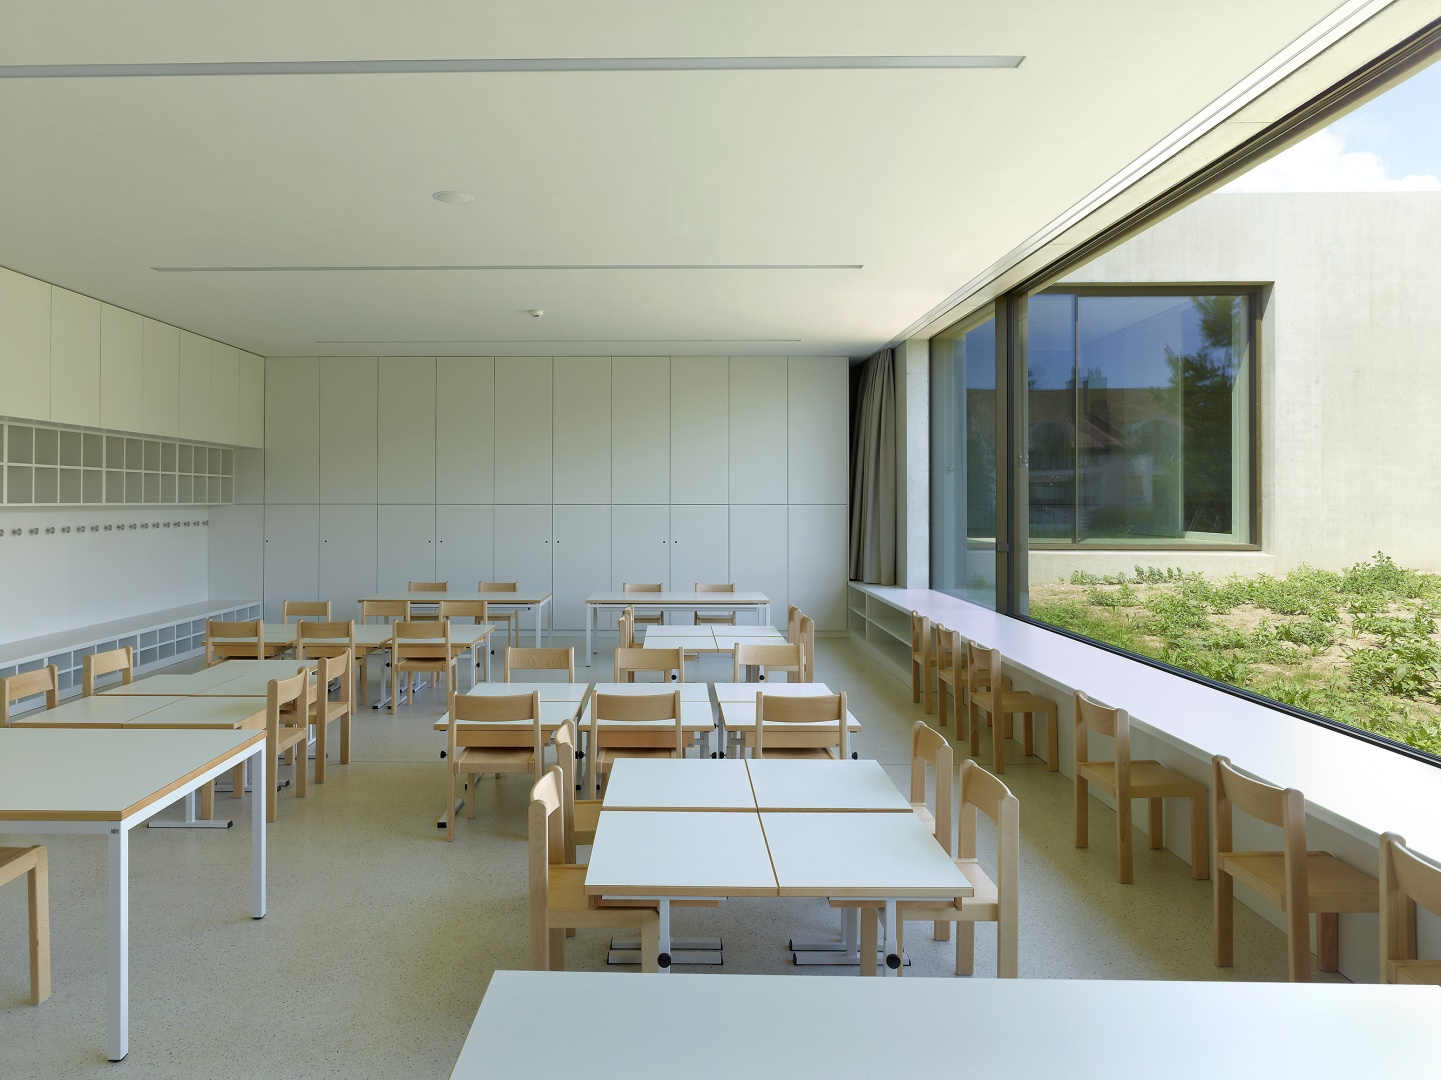 Klassenraum  © Thomas Jantscher